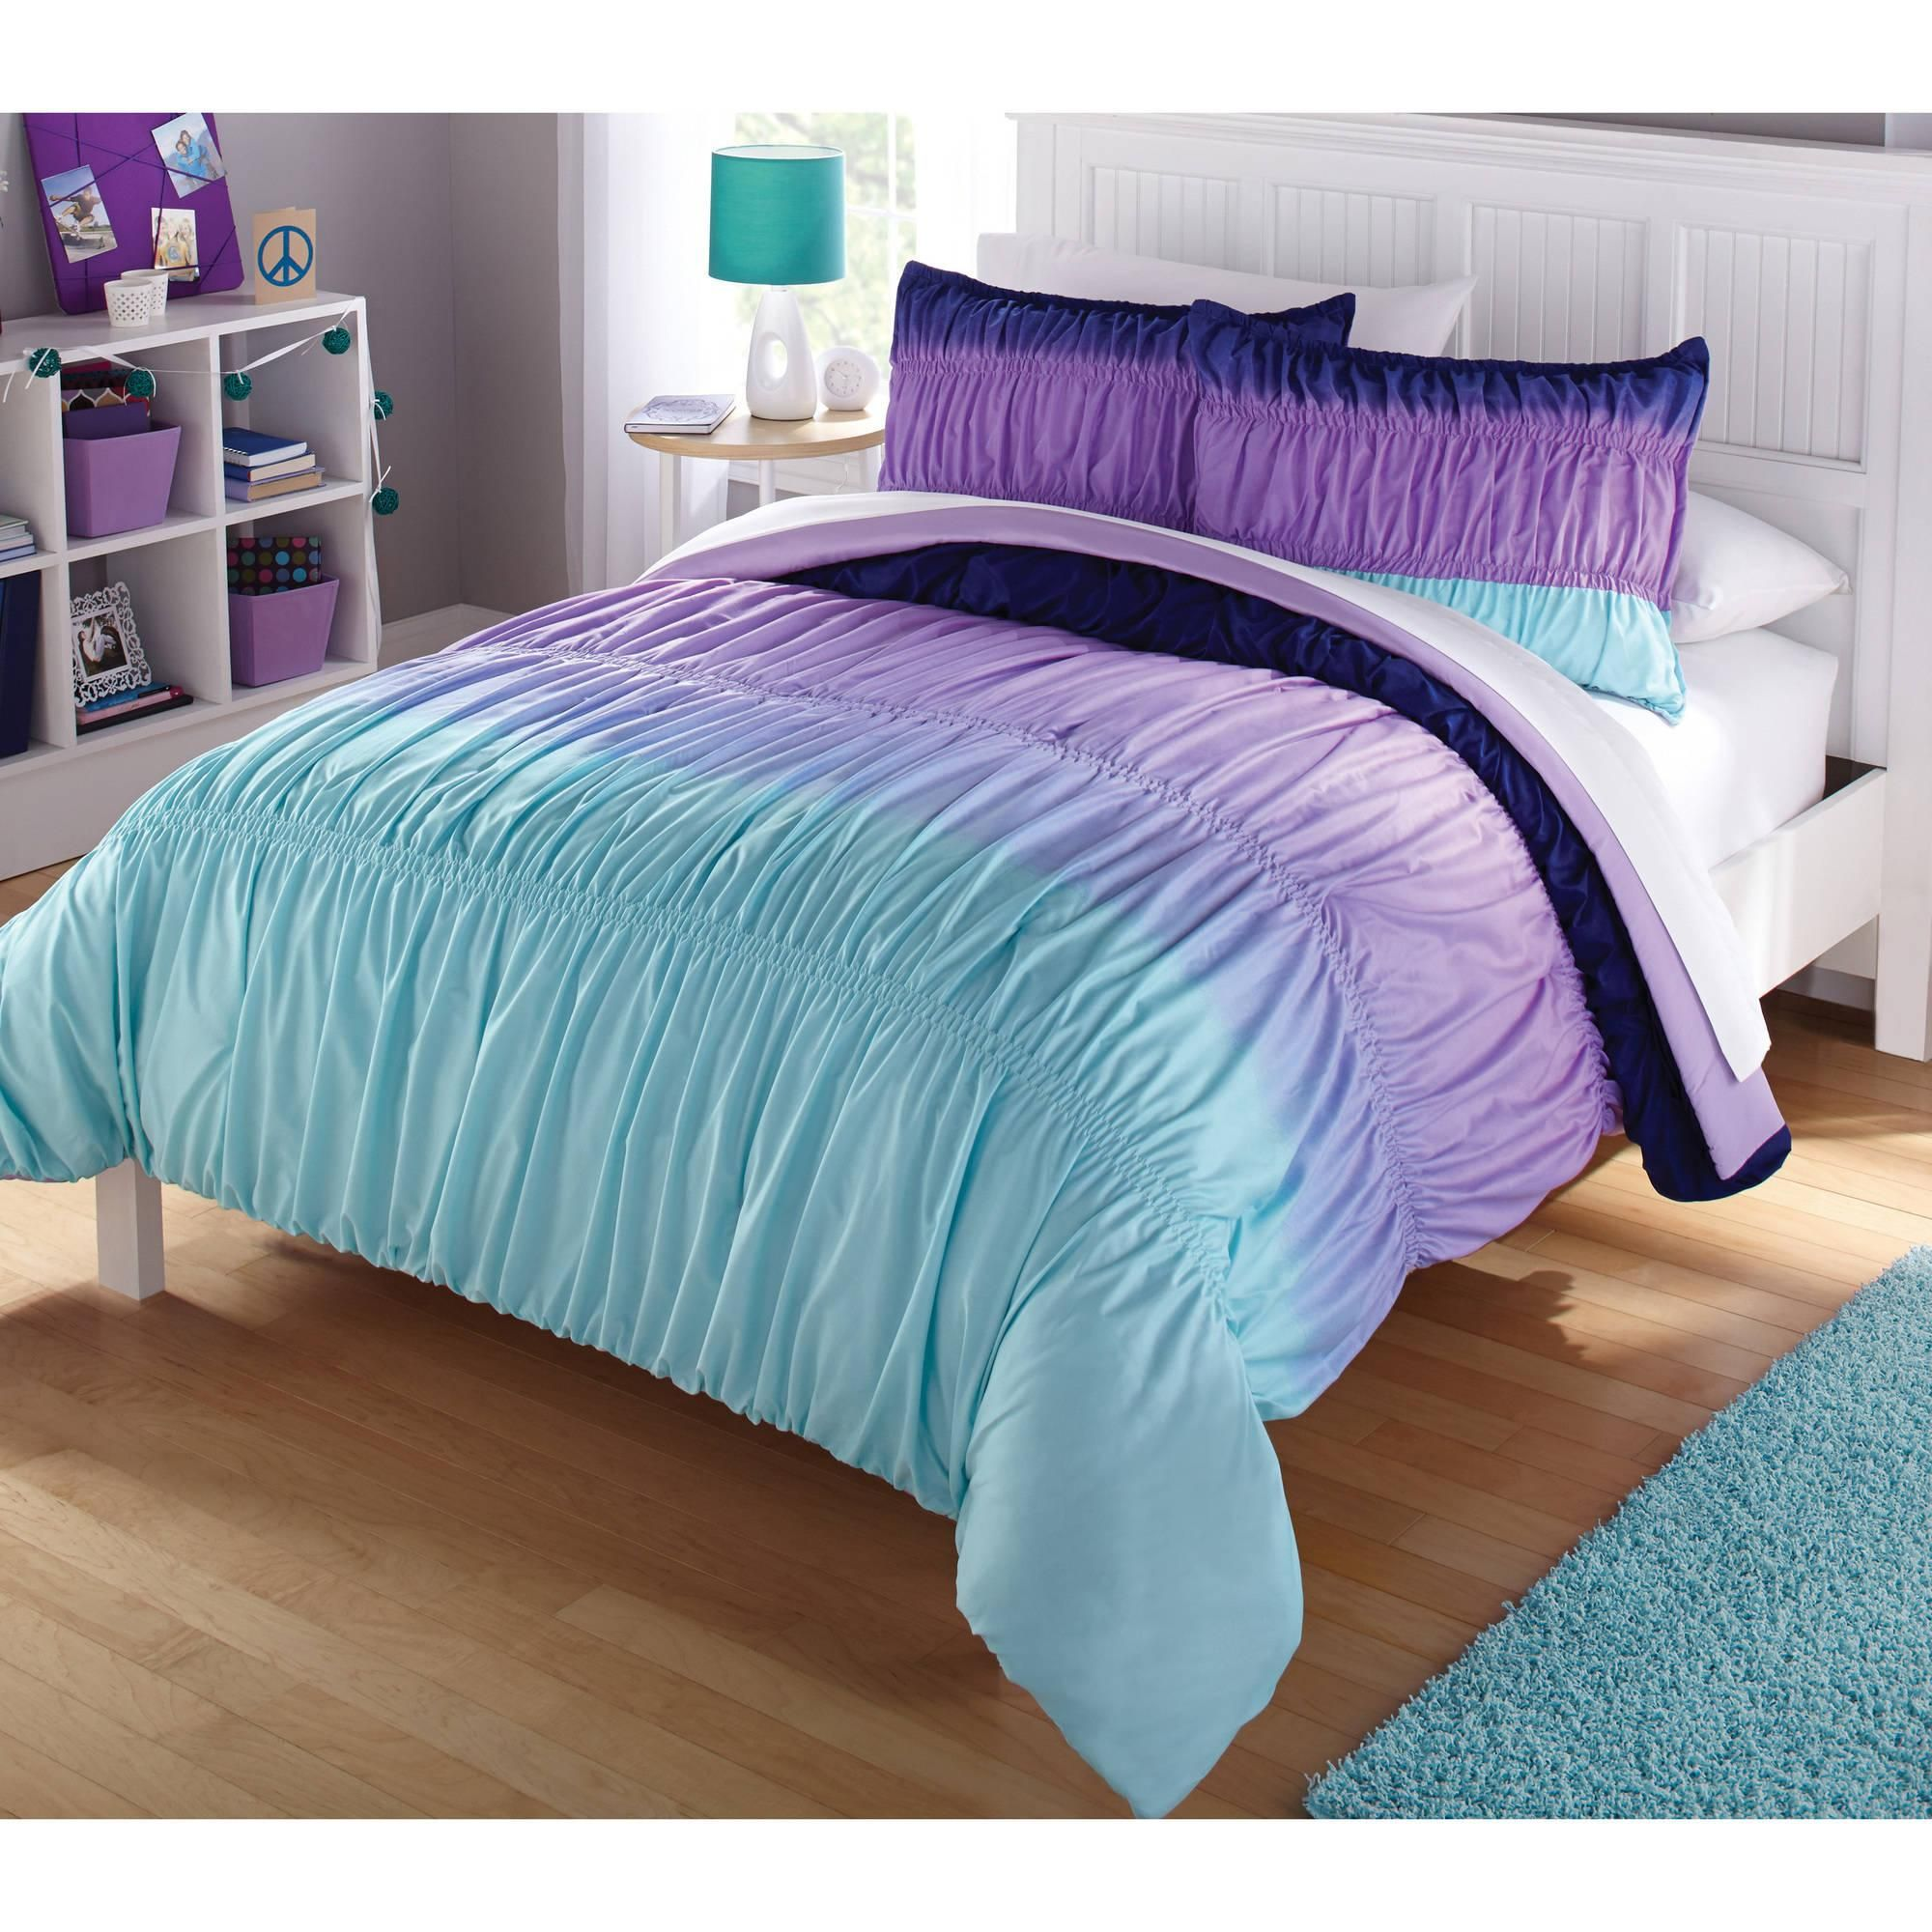 comforter lavender aqua and blue - Google Search | for ...